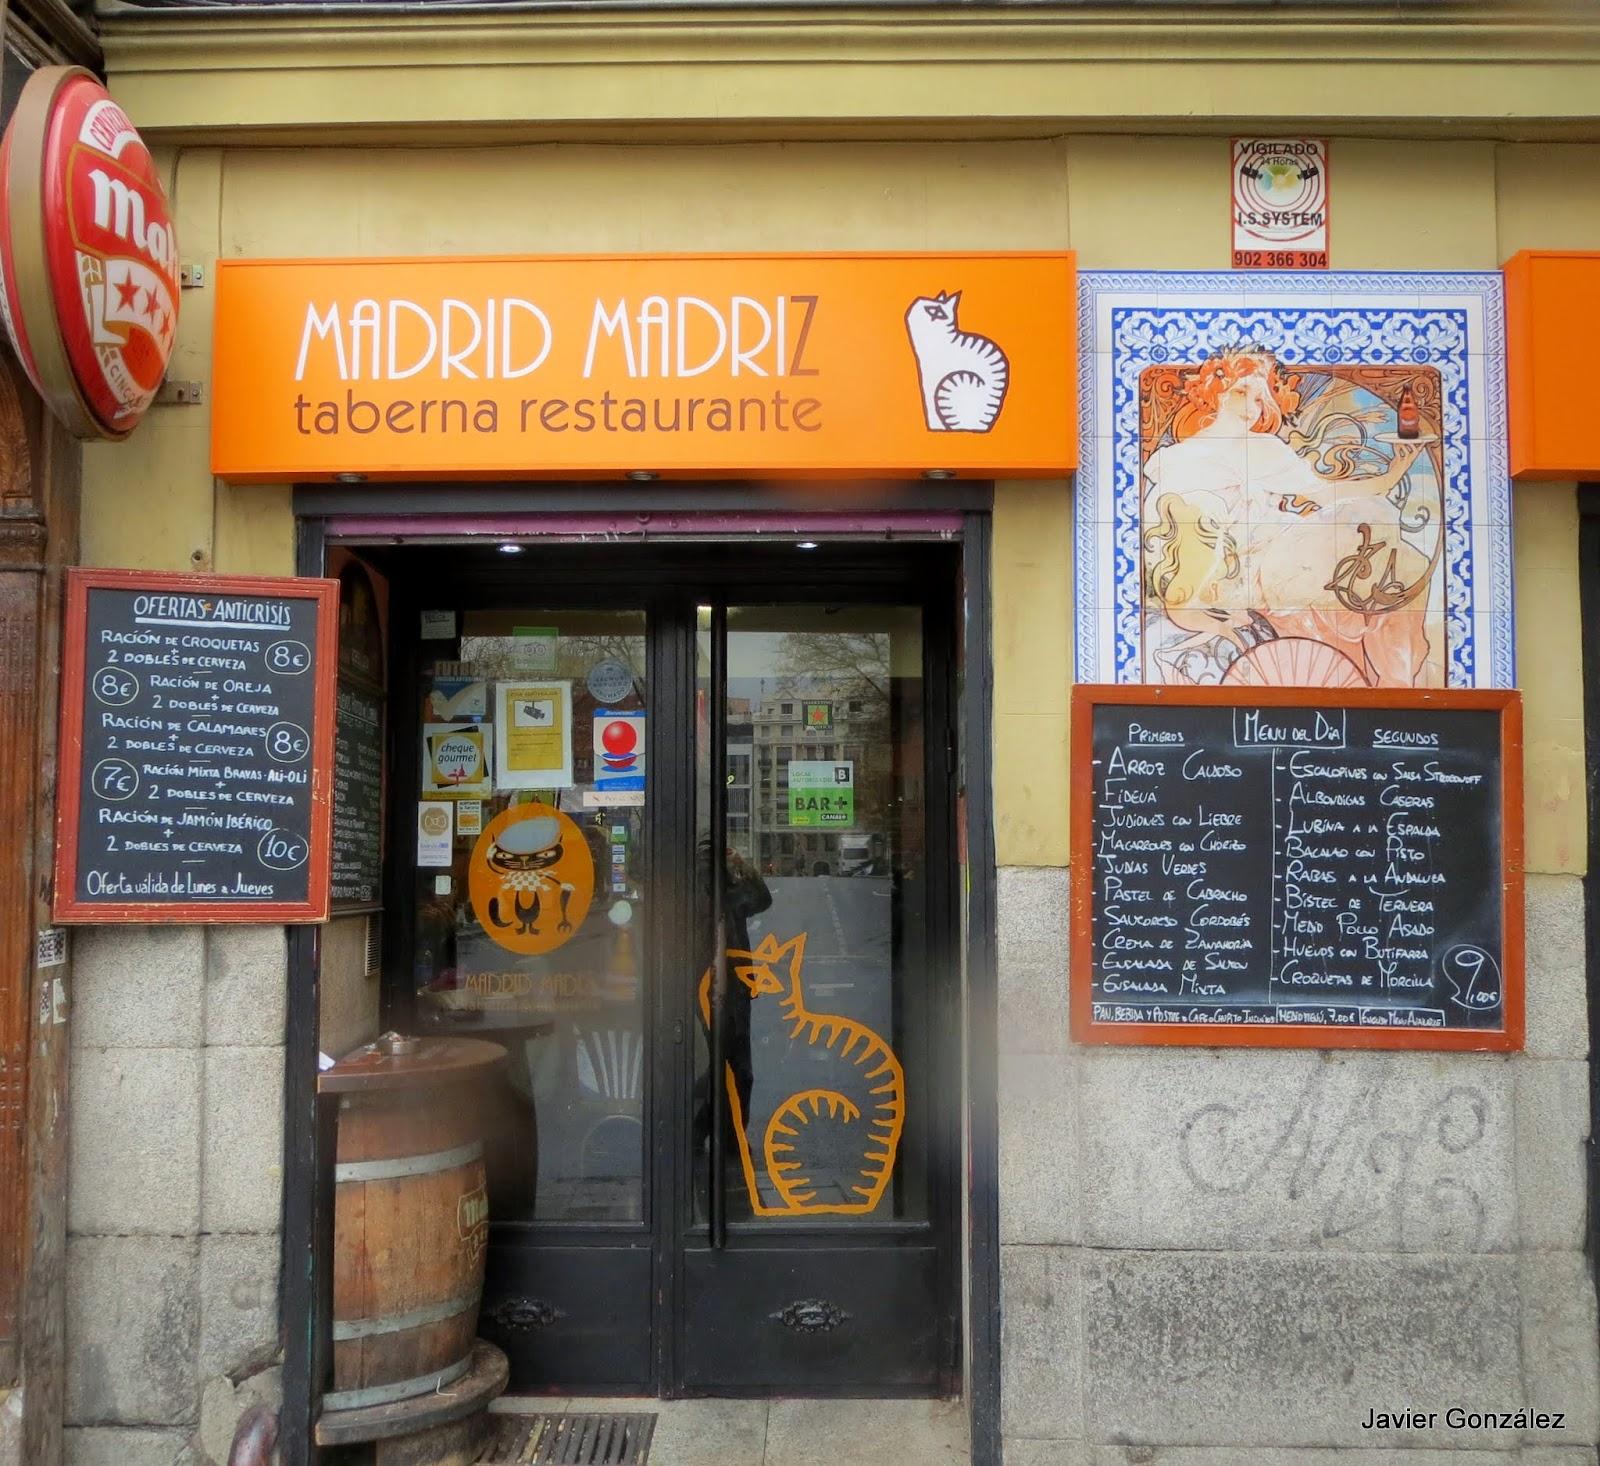 Taberna Madrid Madriz